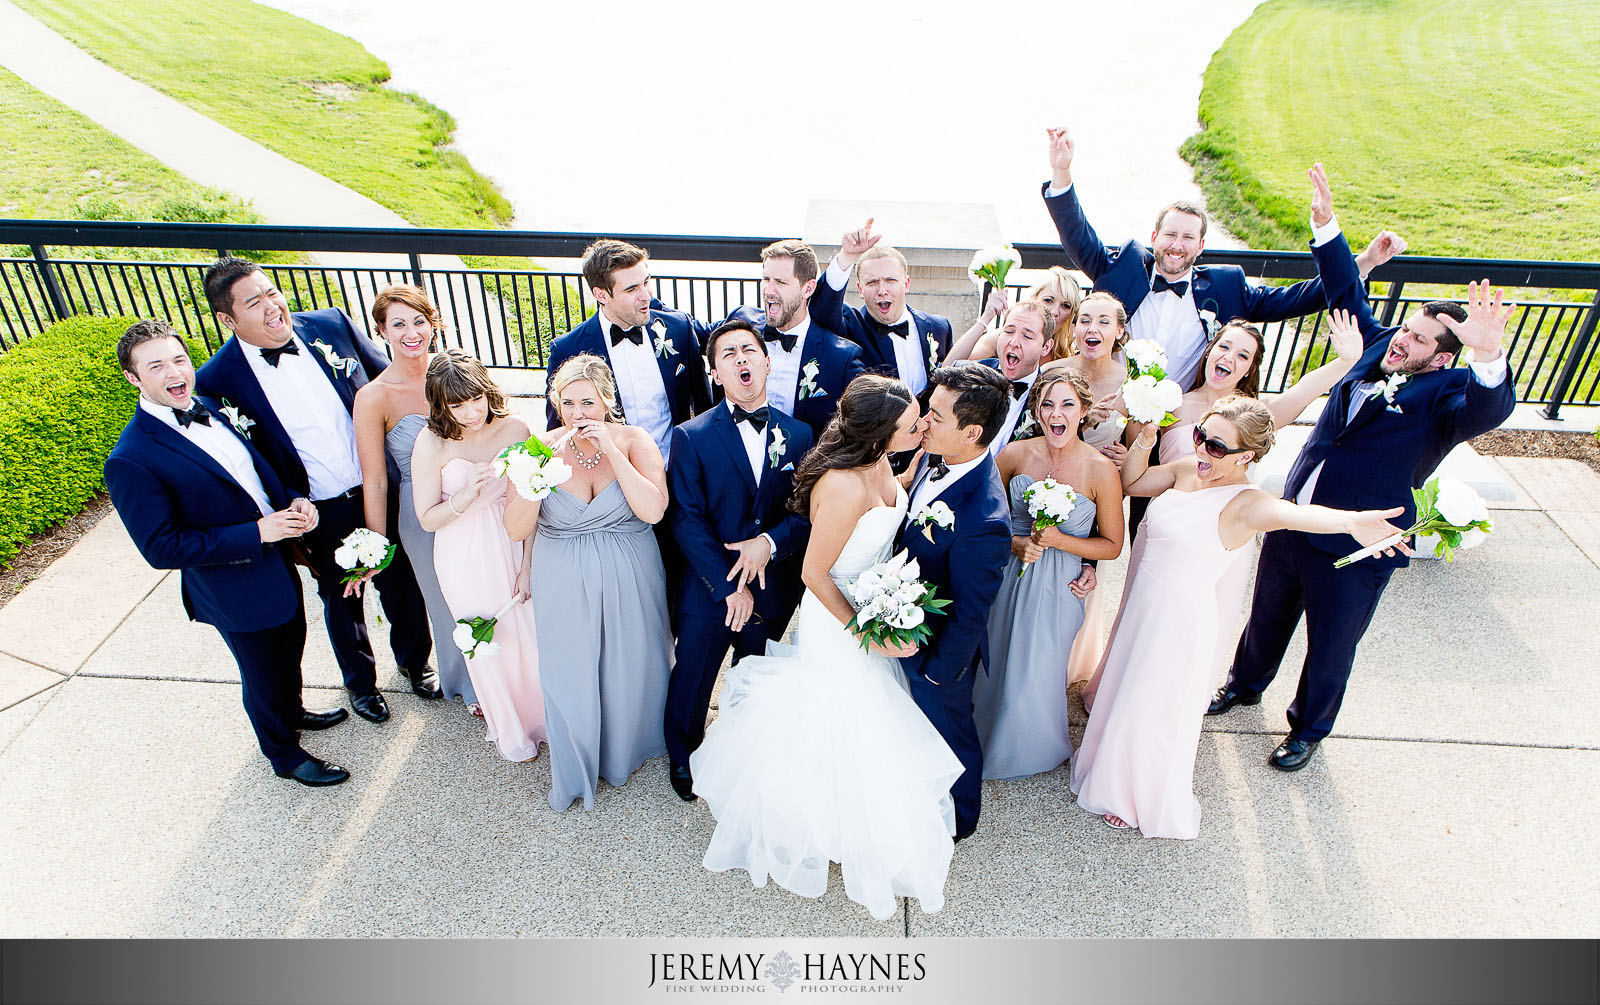 silly-wedding-party-photos-coxhall-gardens